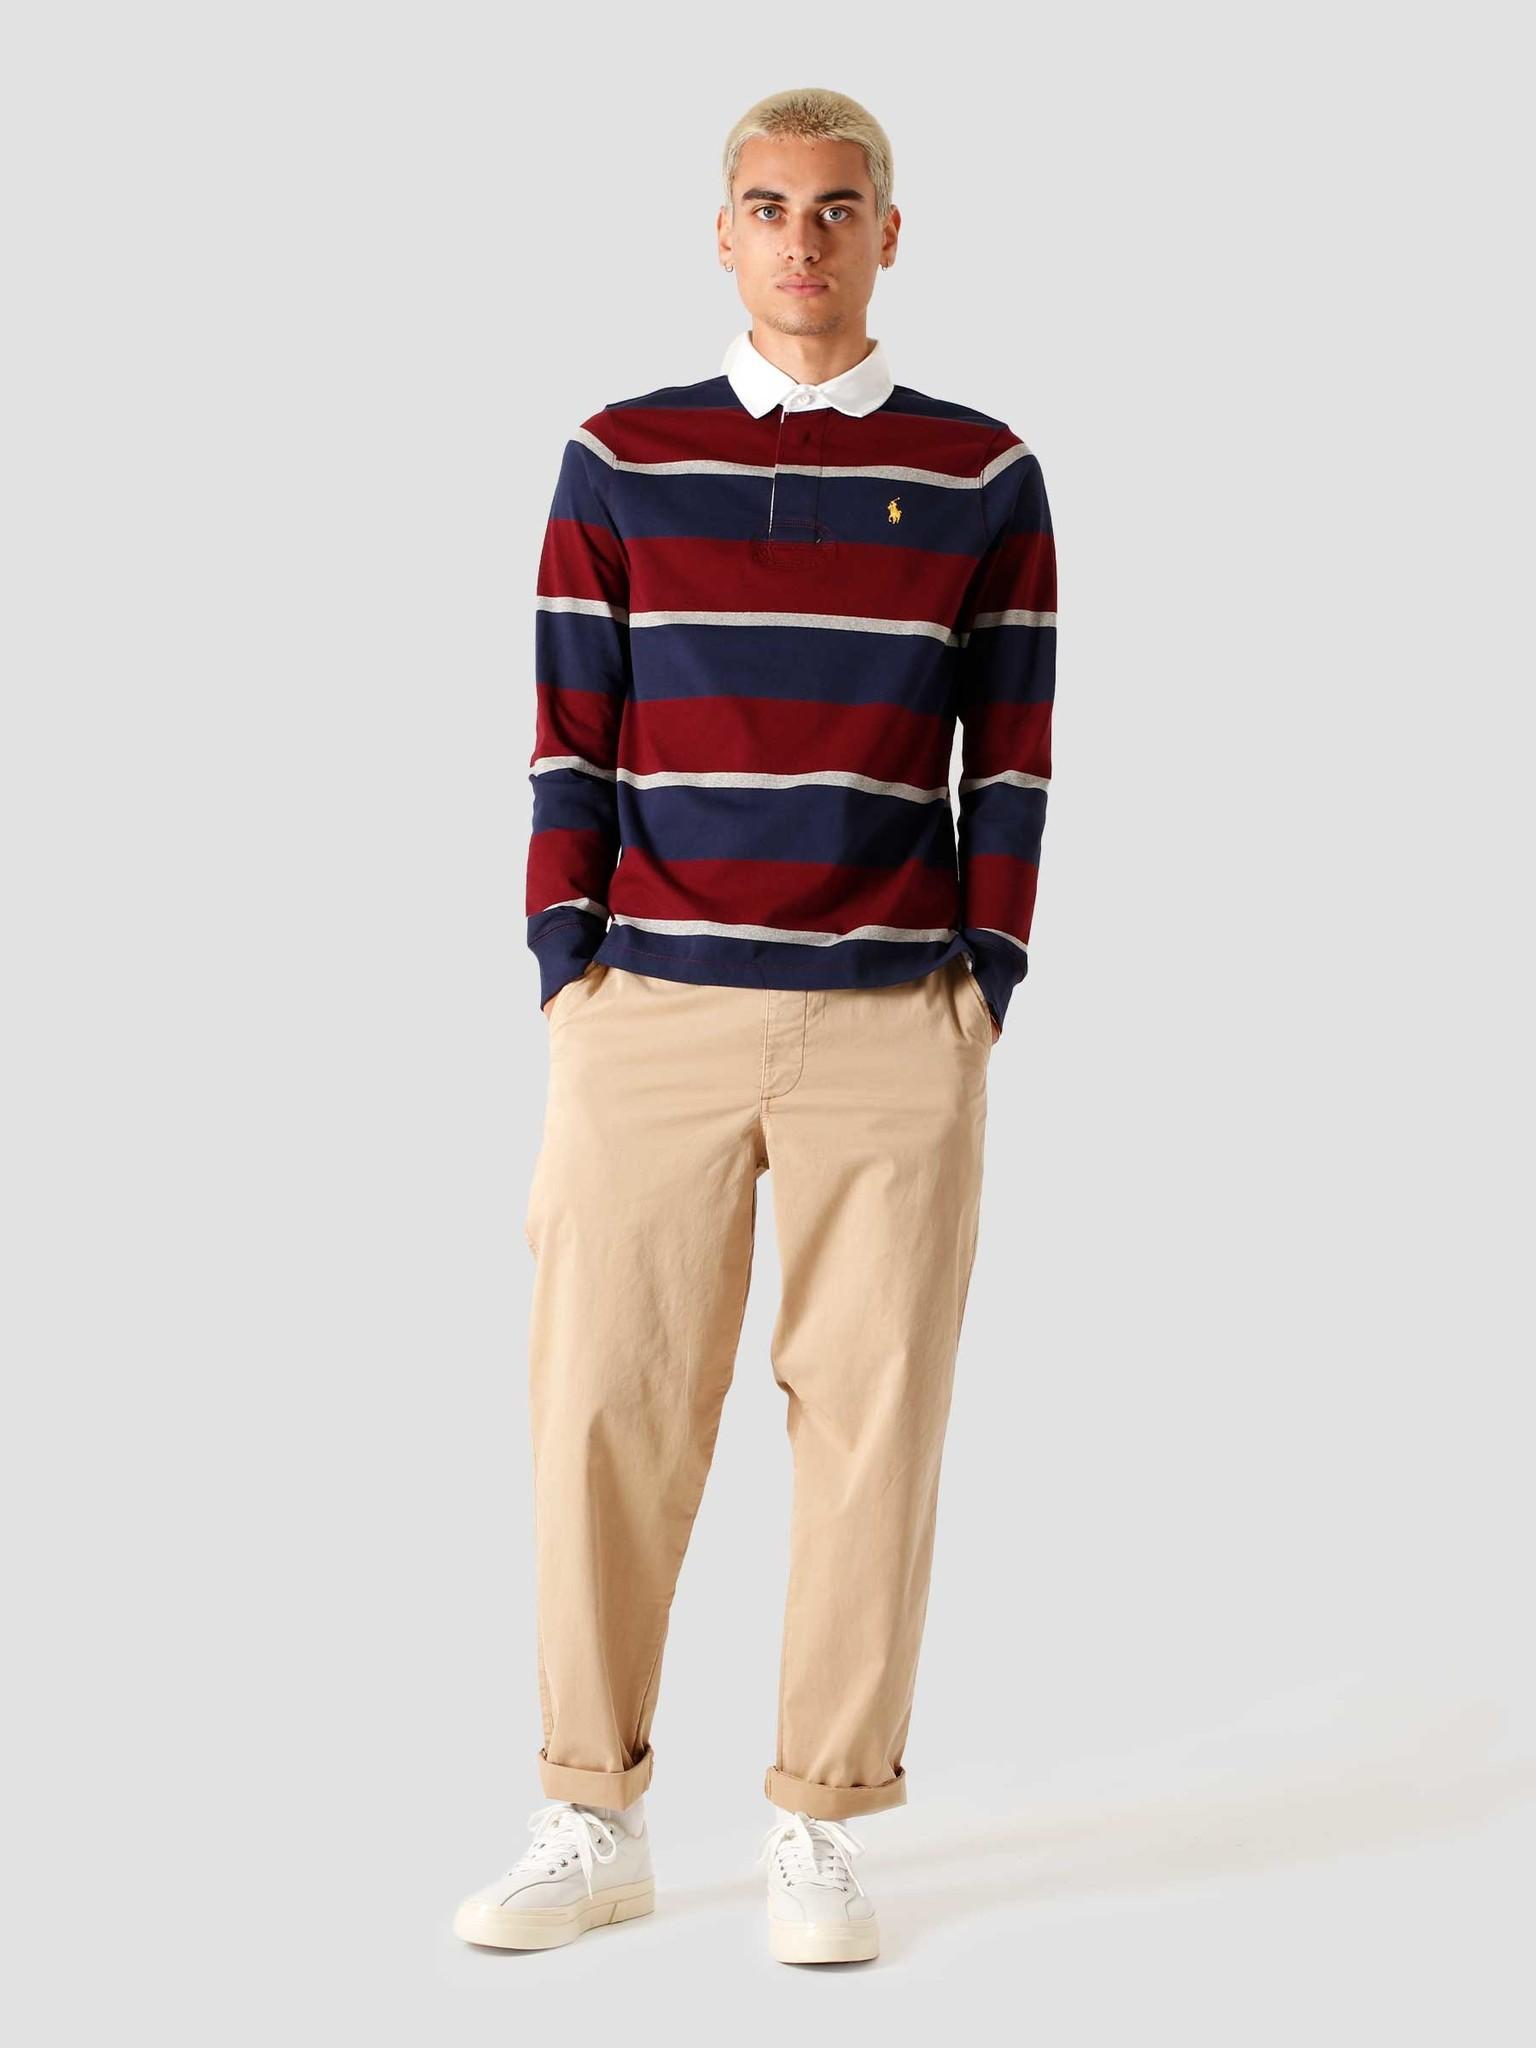 Polo Ralph Lauren Polo Ralph Lauren Long Sleeve Knitted Sweater Classic Wine Multi 710818479002